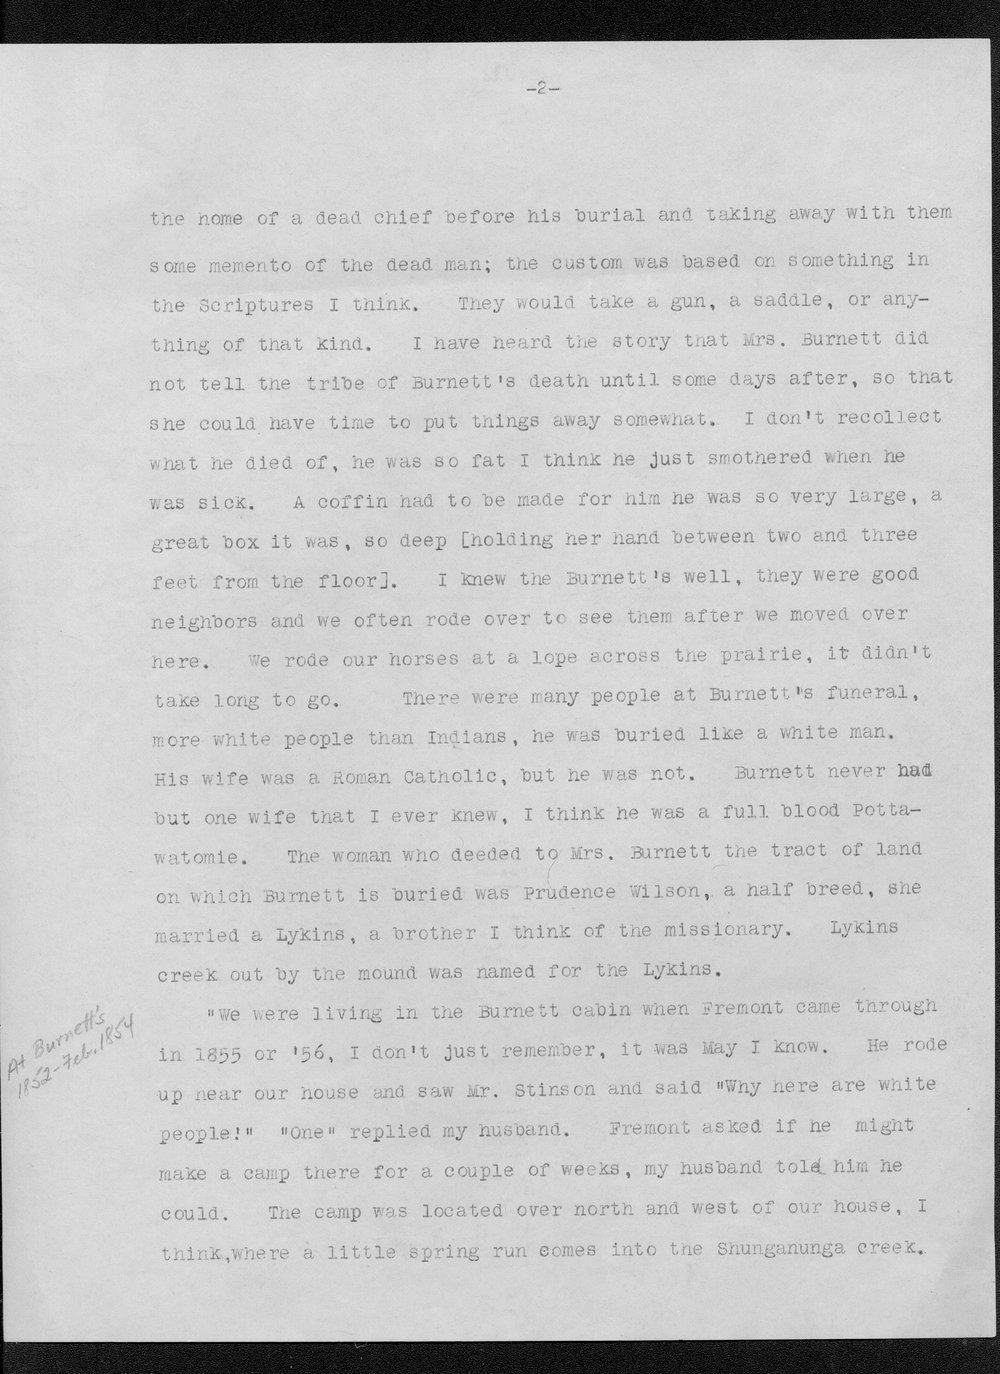 Julia Ann Stinson correspondence - 2